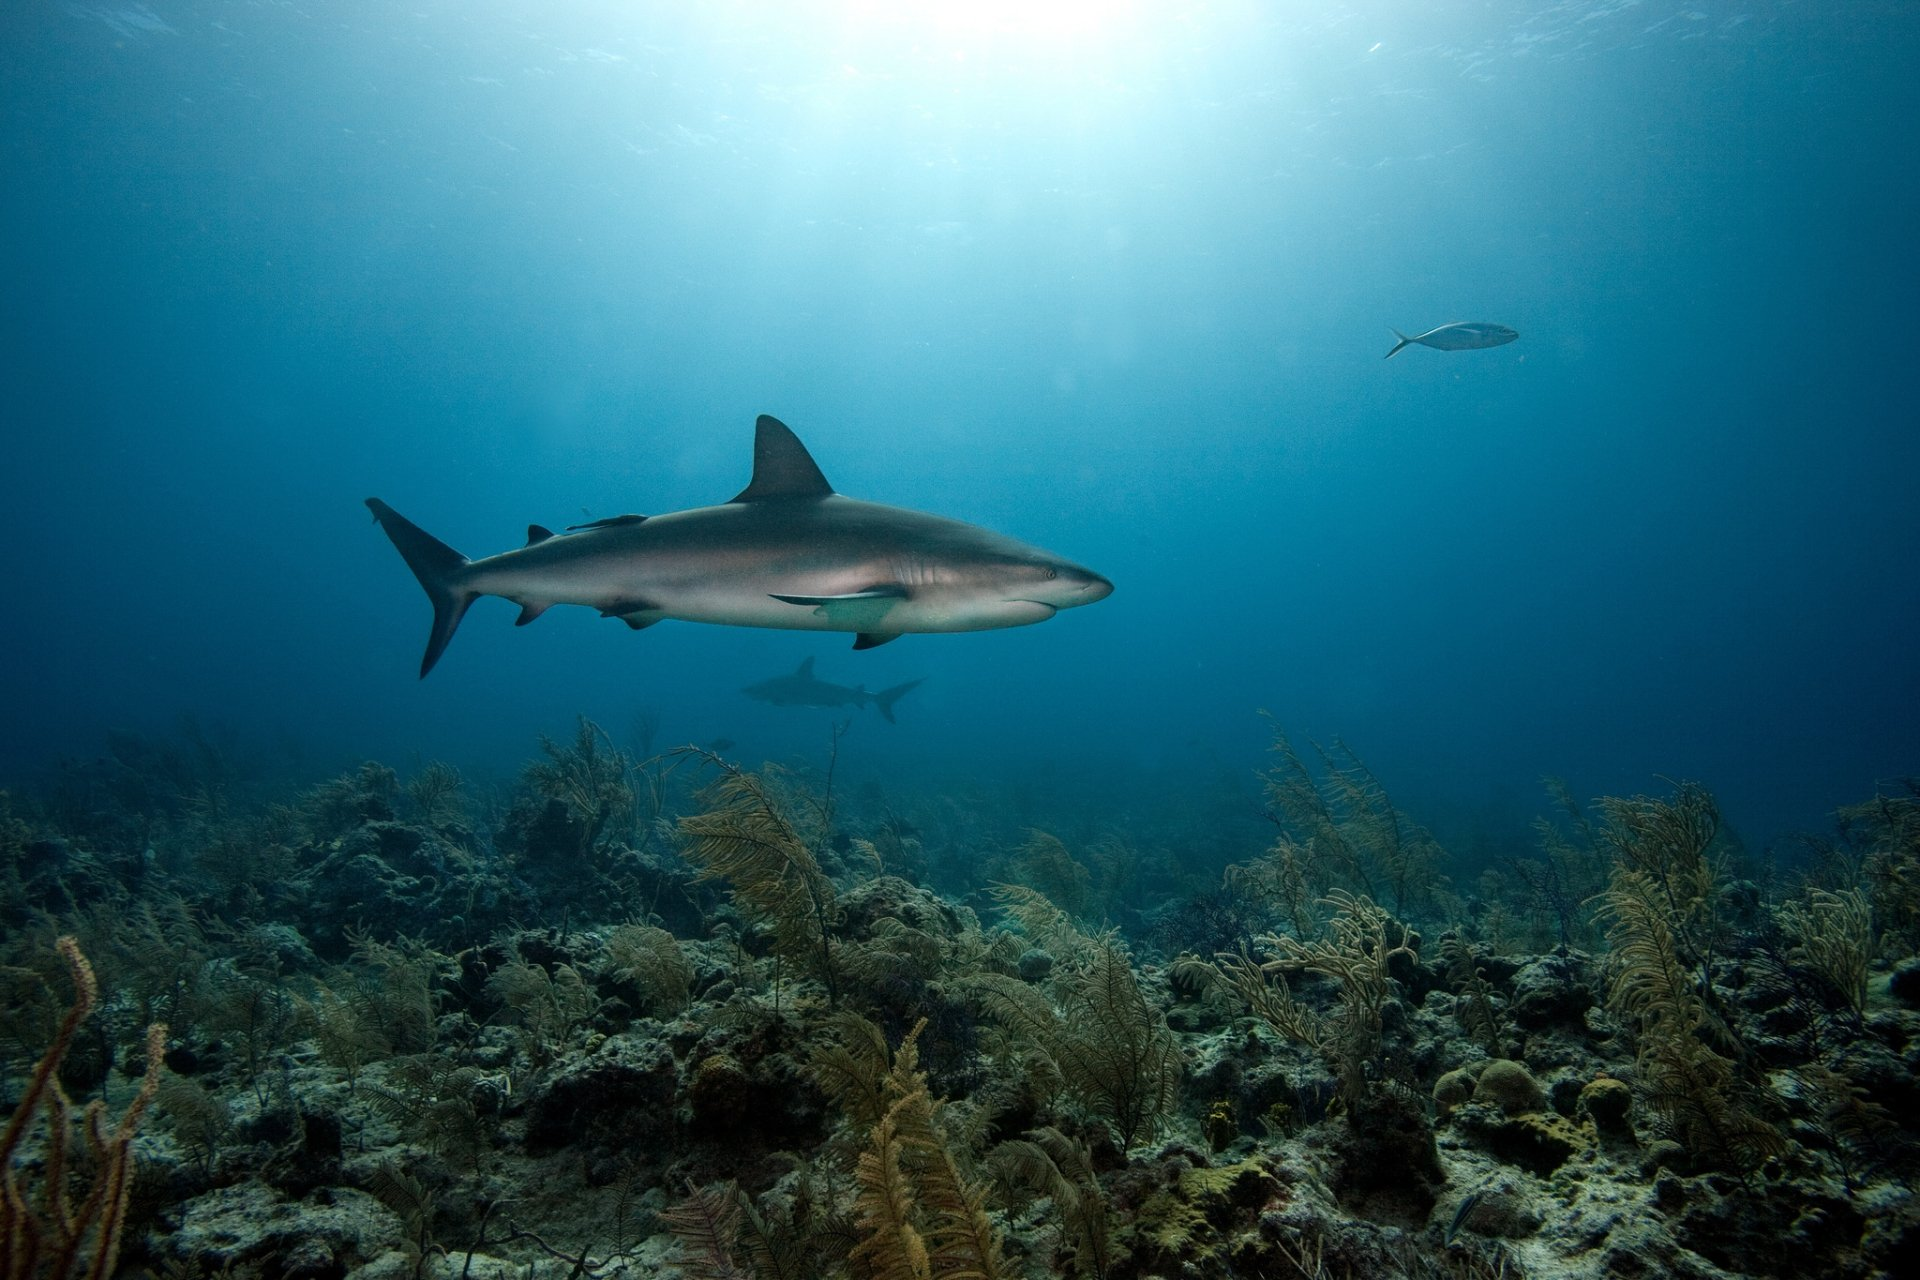 Animal - Shark  Fish Underwater Ocean Coral predator (Animal) Wallpaper